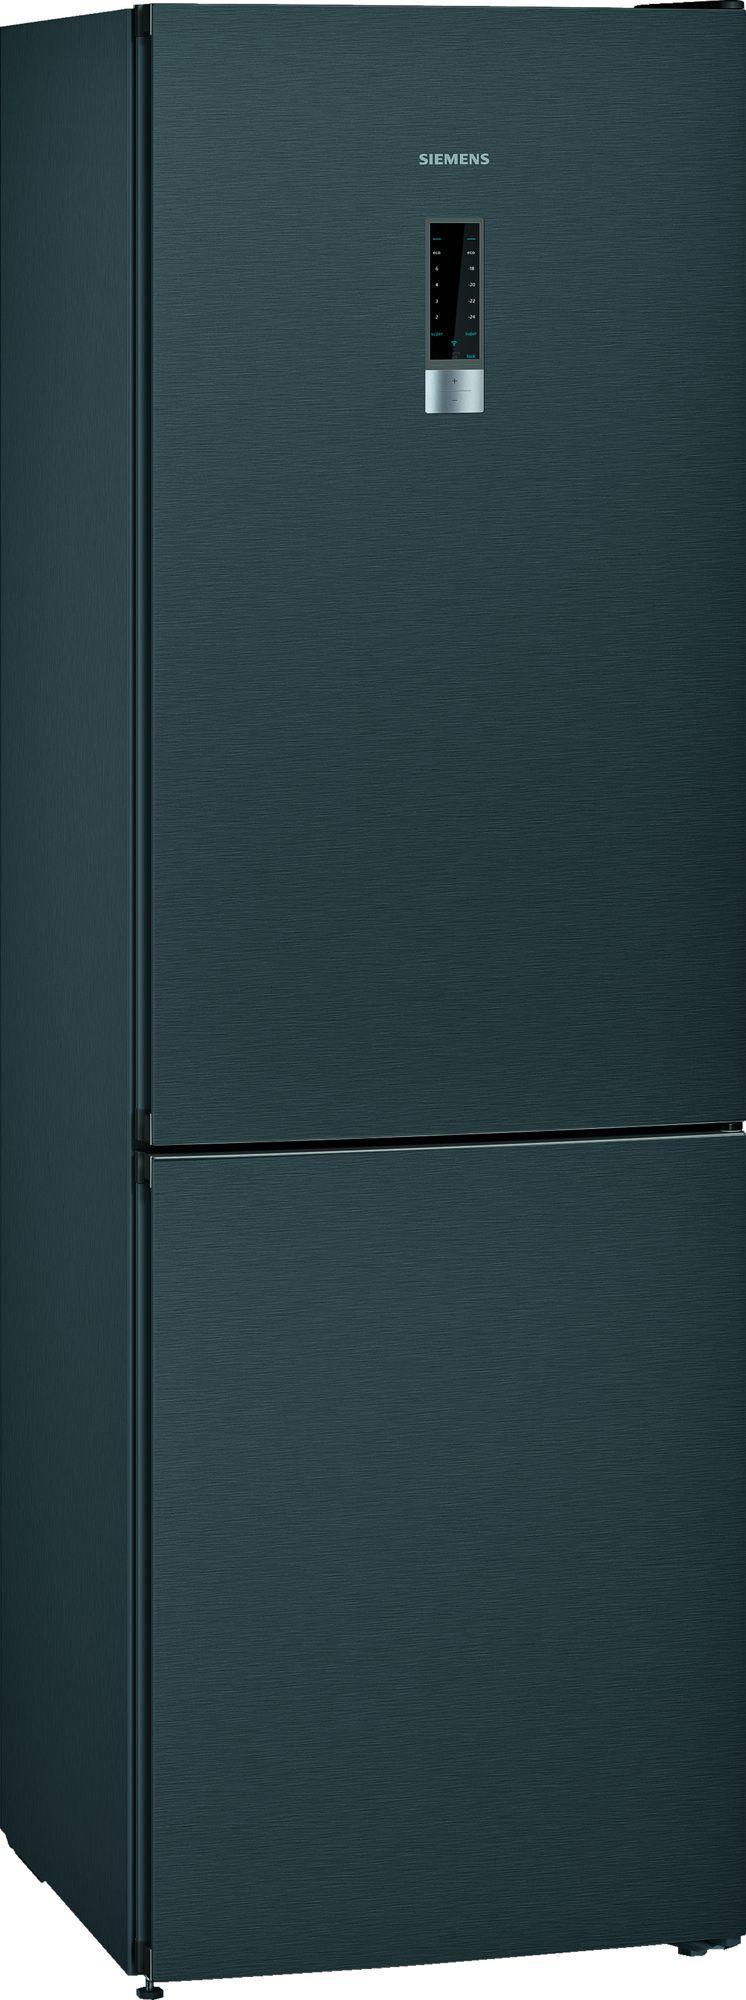 Image of iQ300 KG36NXXDC 60cm 324 Litre Frost Free Fridge Freezer | Black